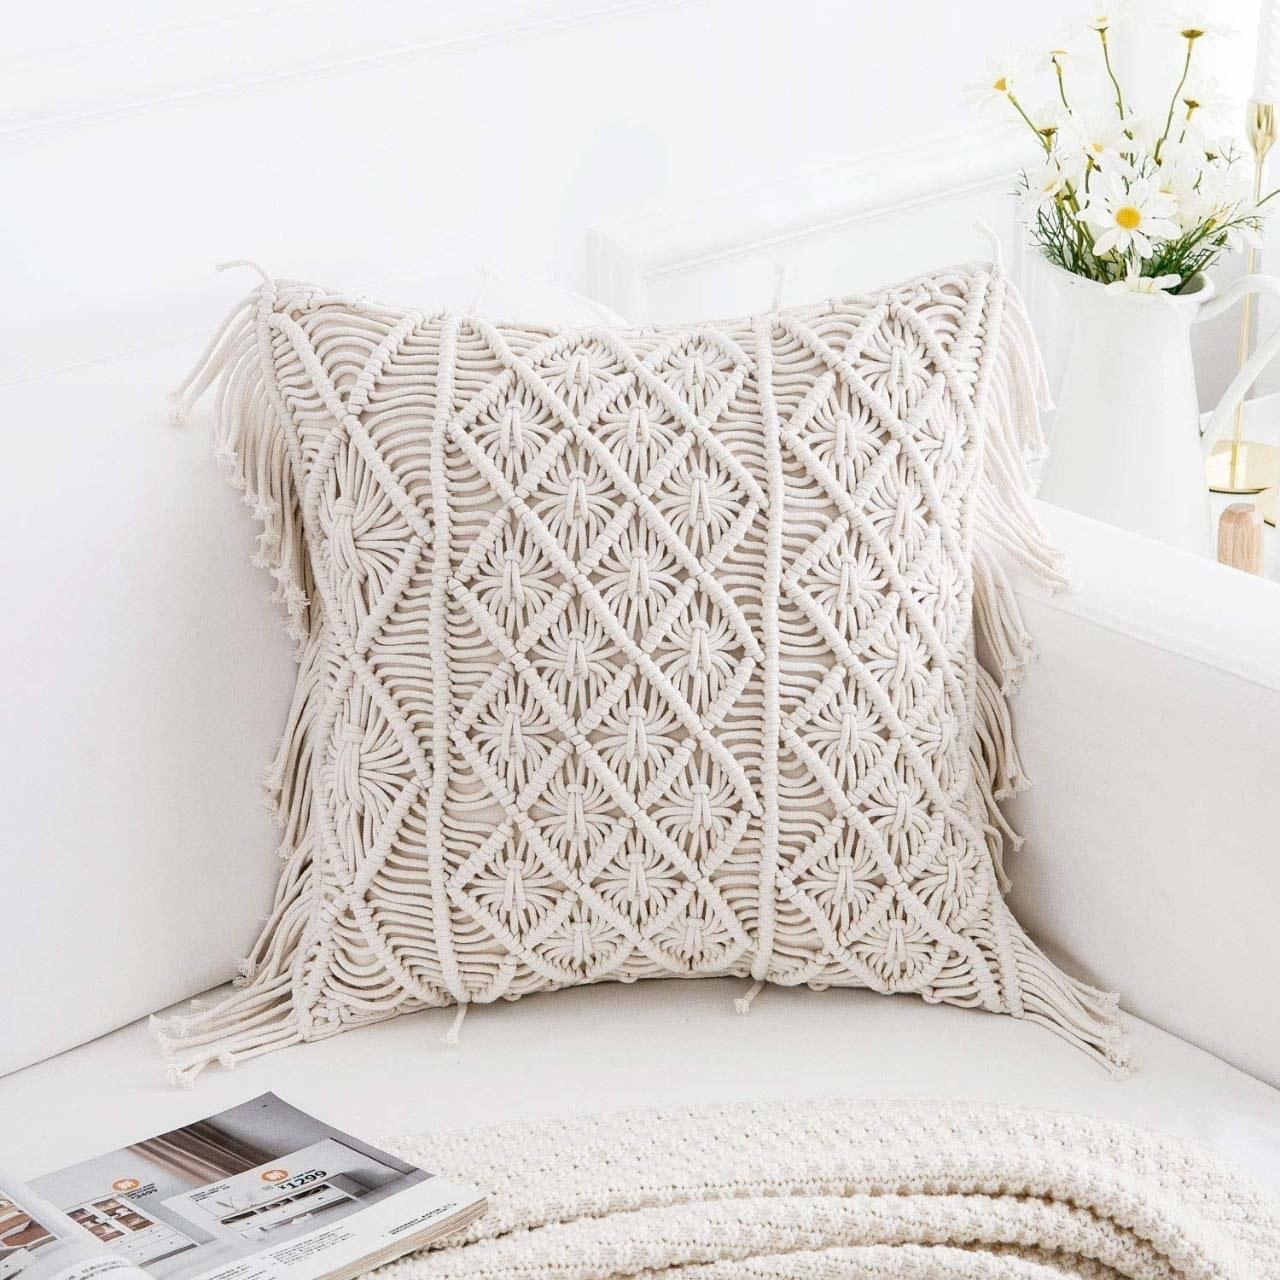 A beige macrame cushion kept on a beige couch.